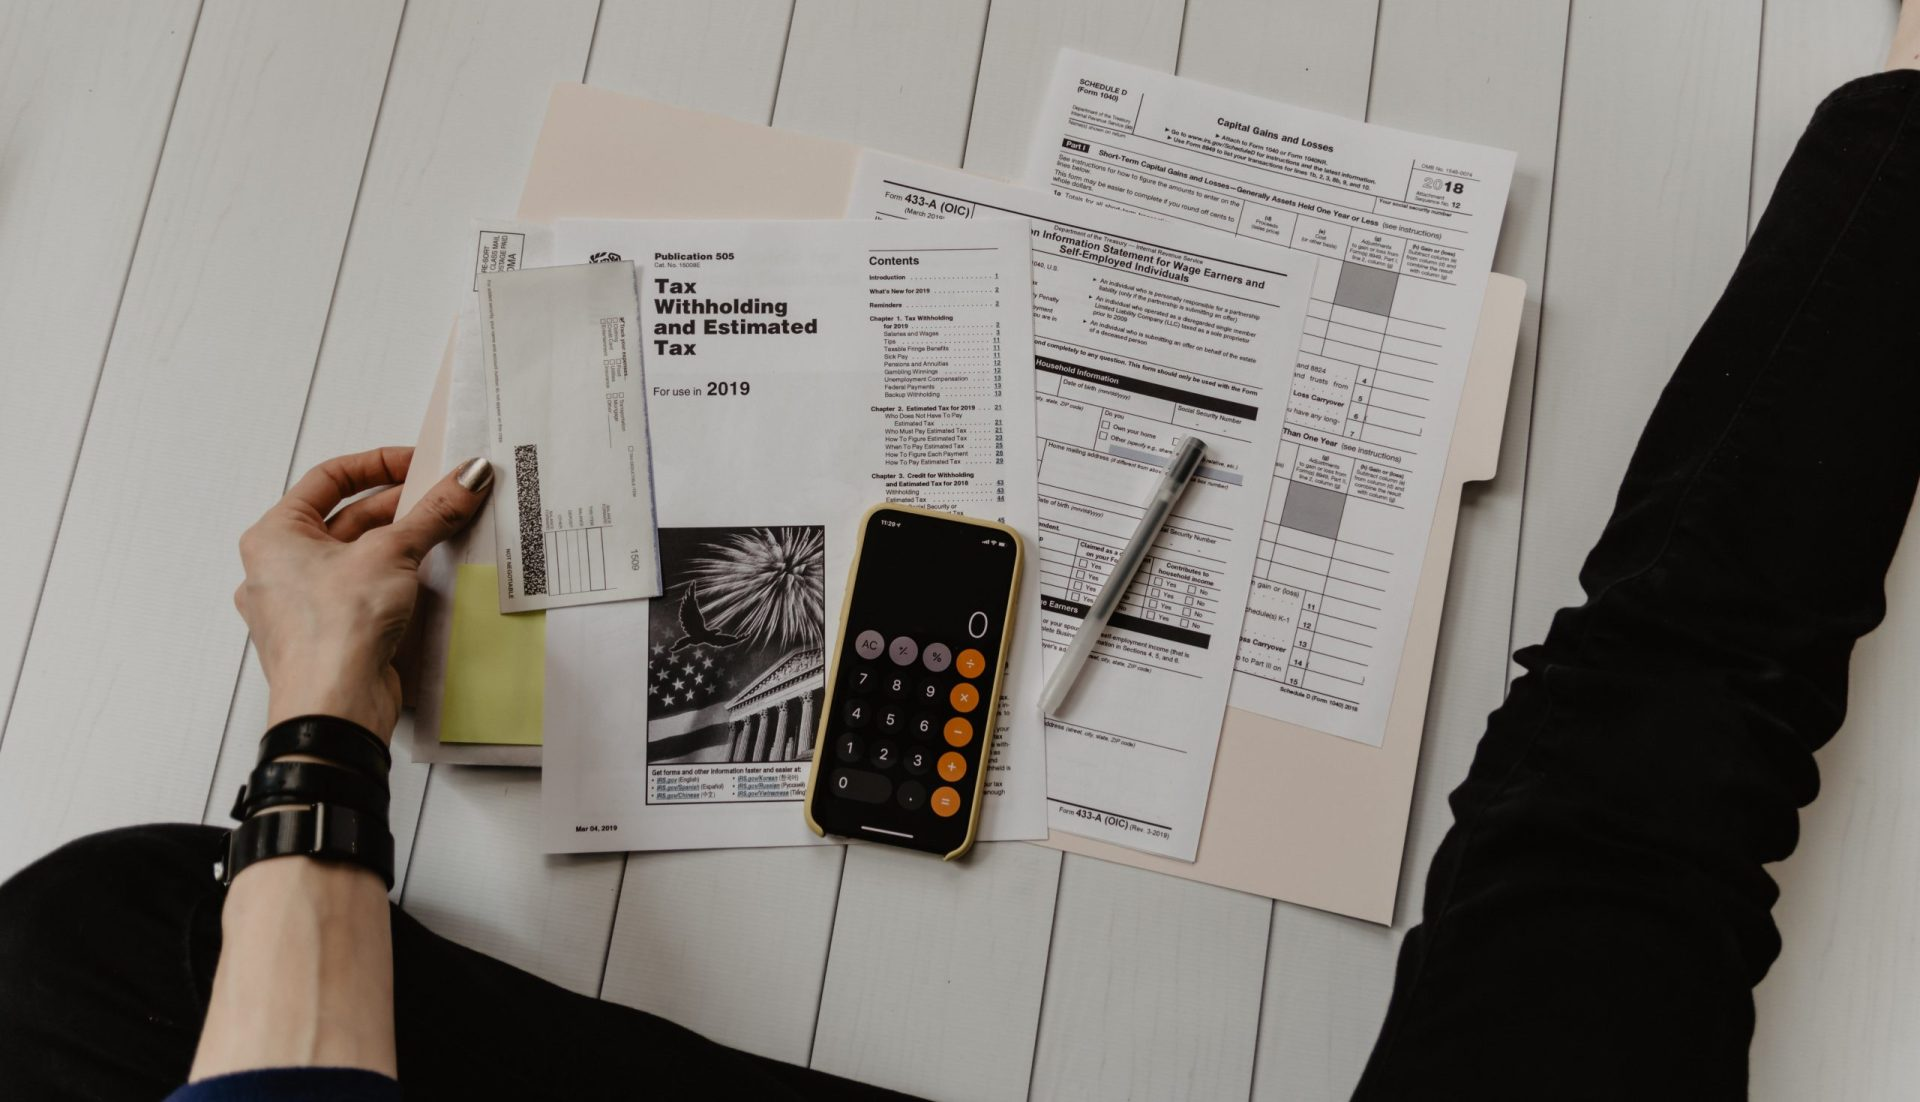 [Guest Post] 5 Money Management Tips for Solopreneurs